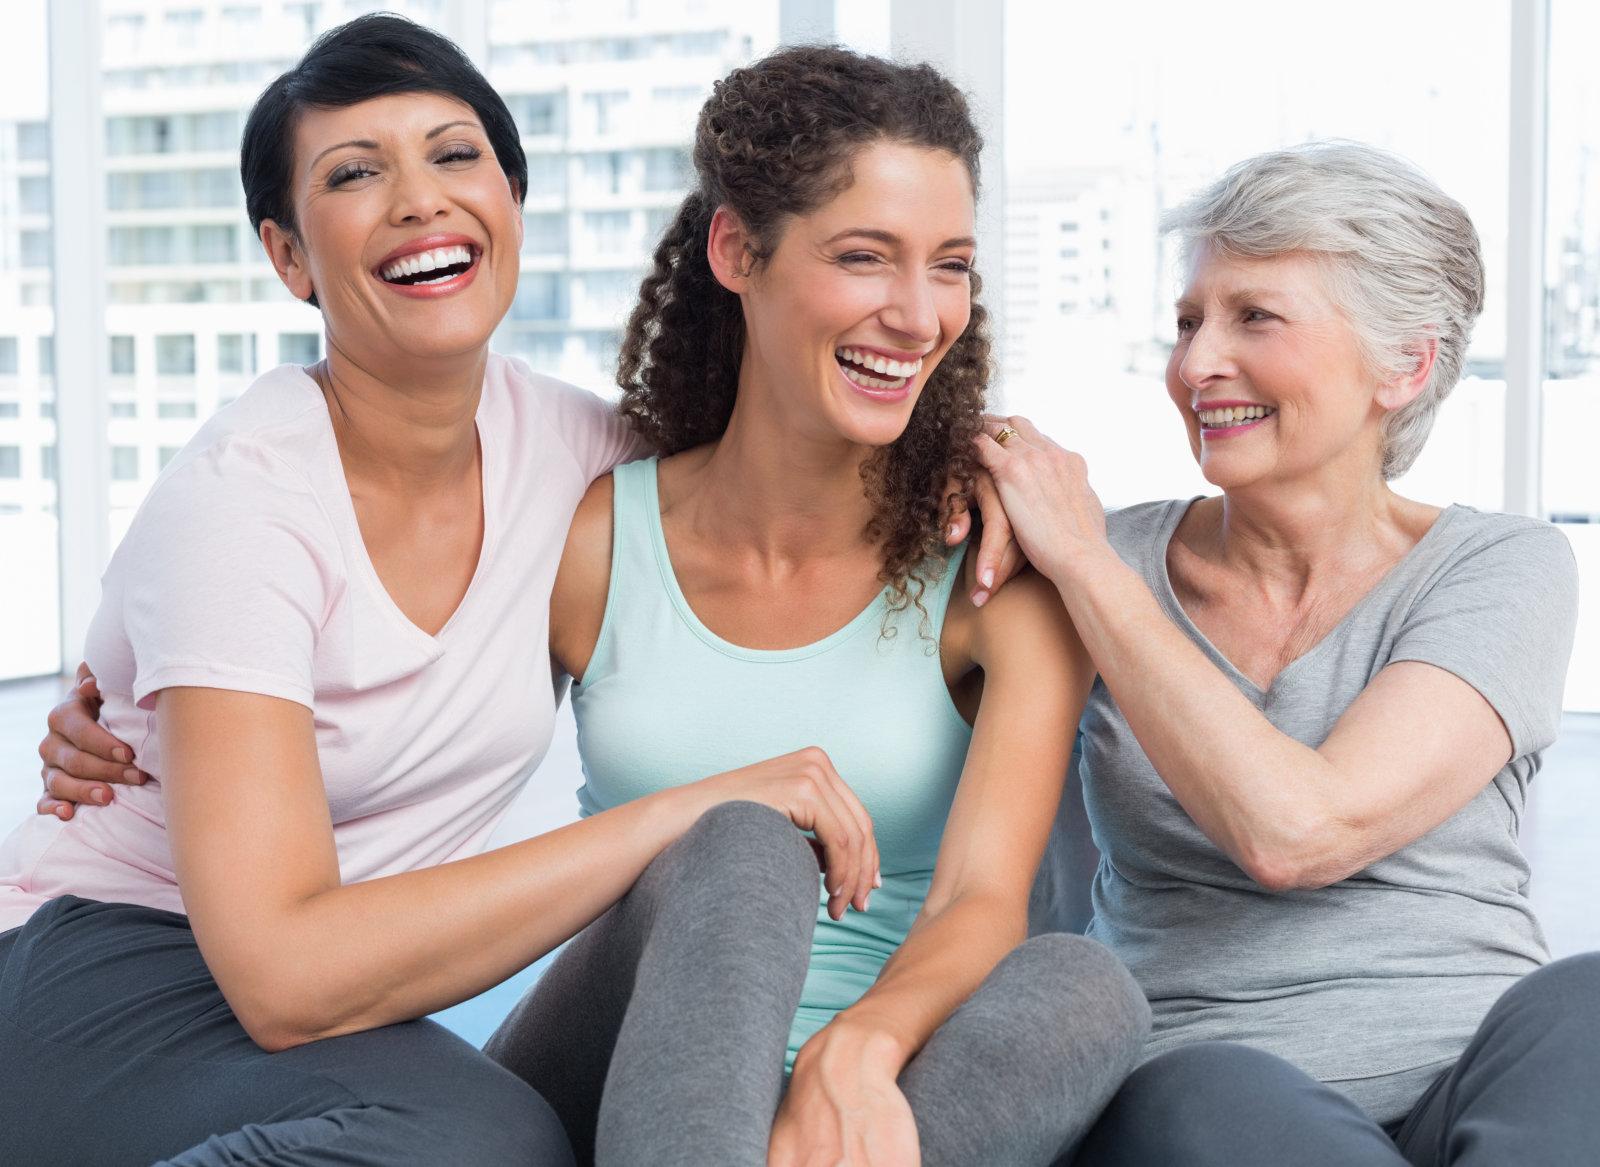 Women's Healthcare and Wellness - Falguni Patel, MD, FACOG - Aberdeen NJ OBGYN